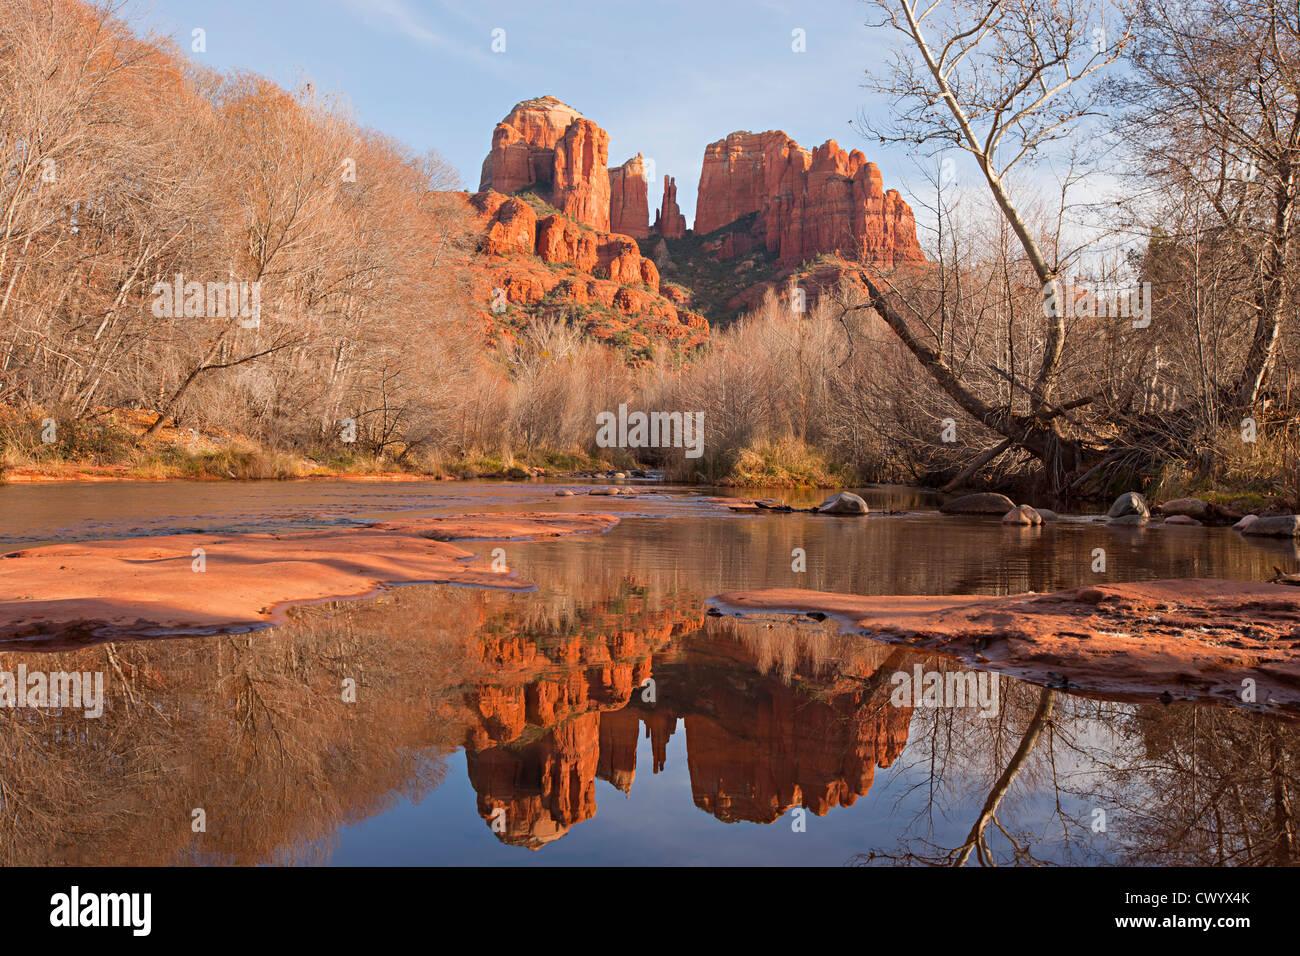 Cathedral Rock, Sedona, Arizona USA Stockbild